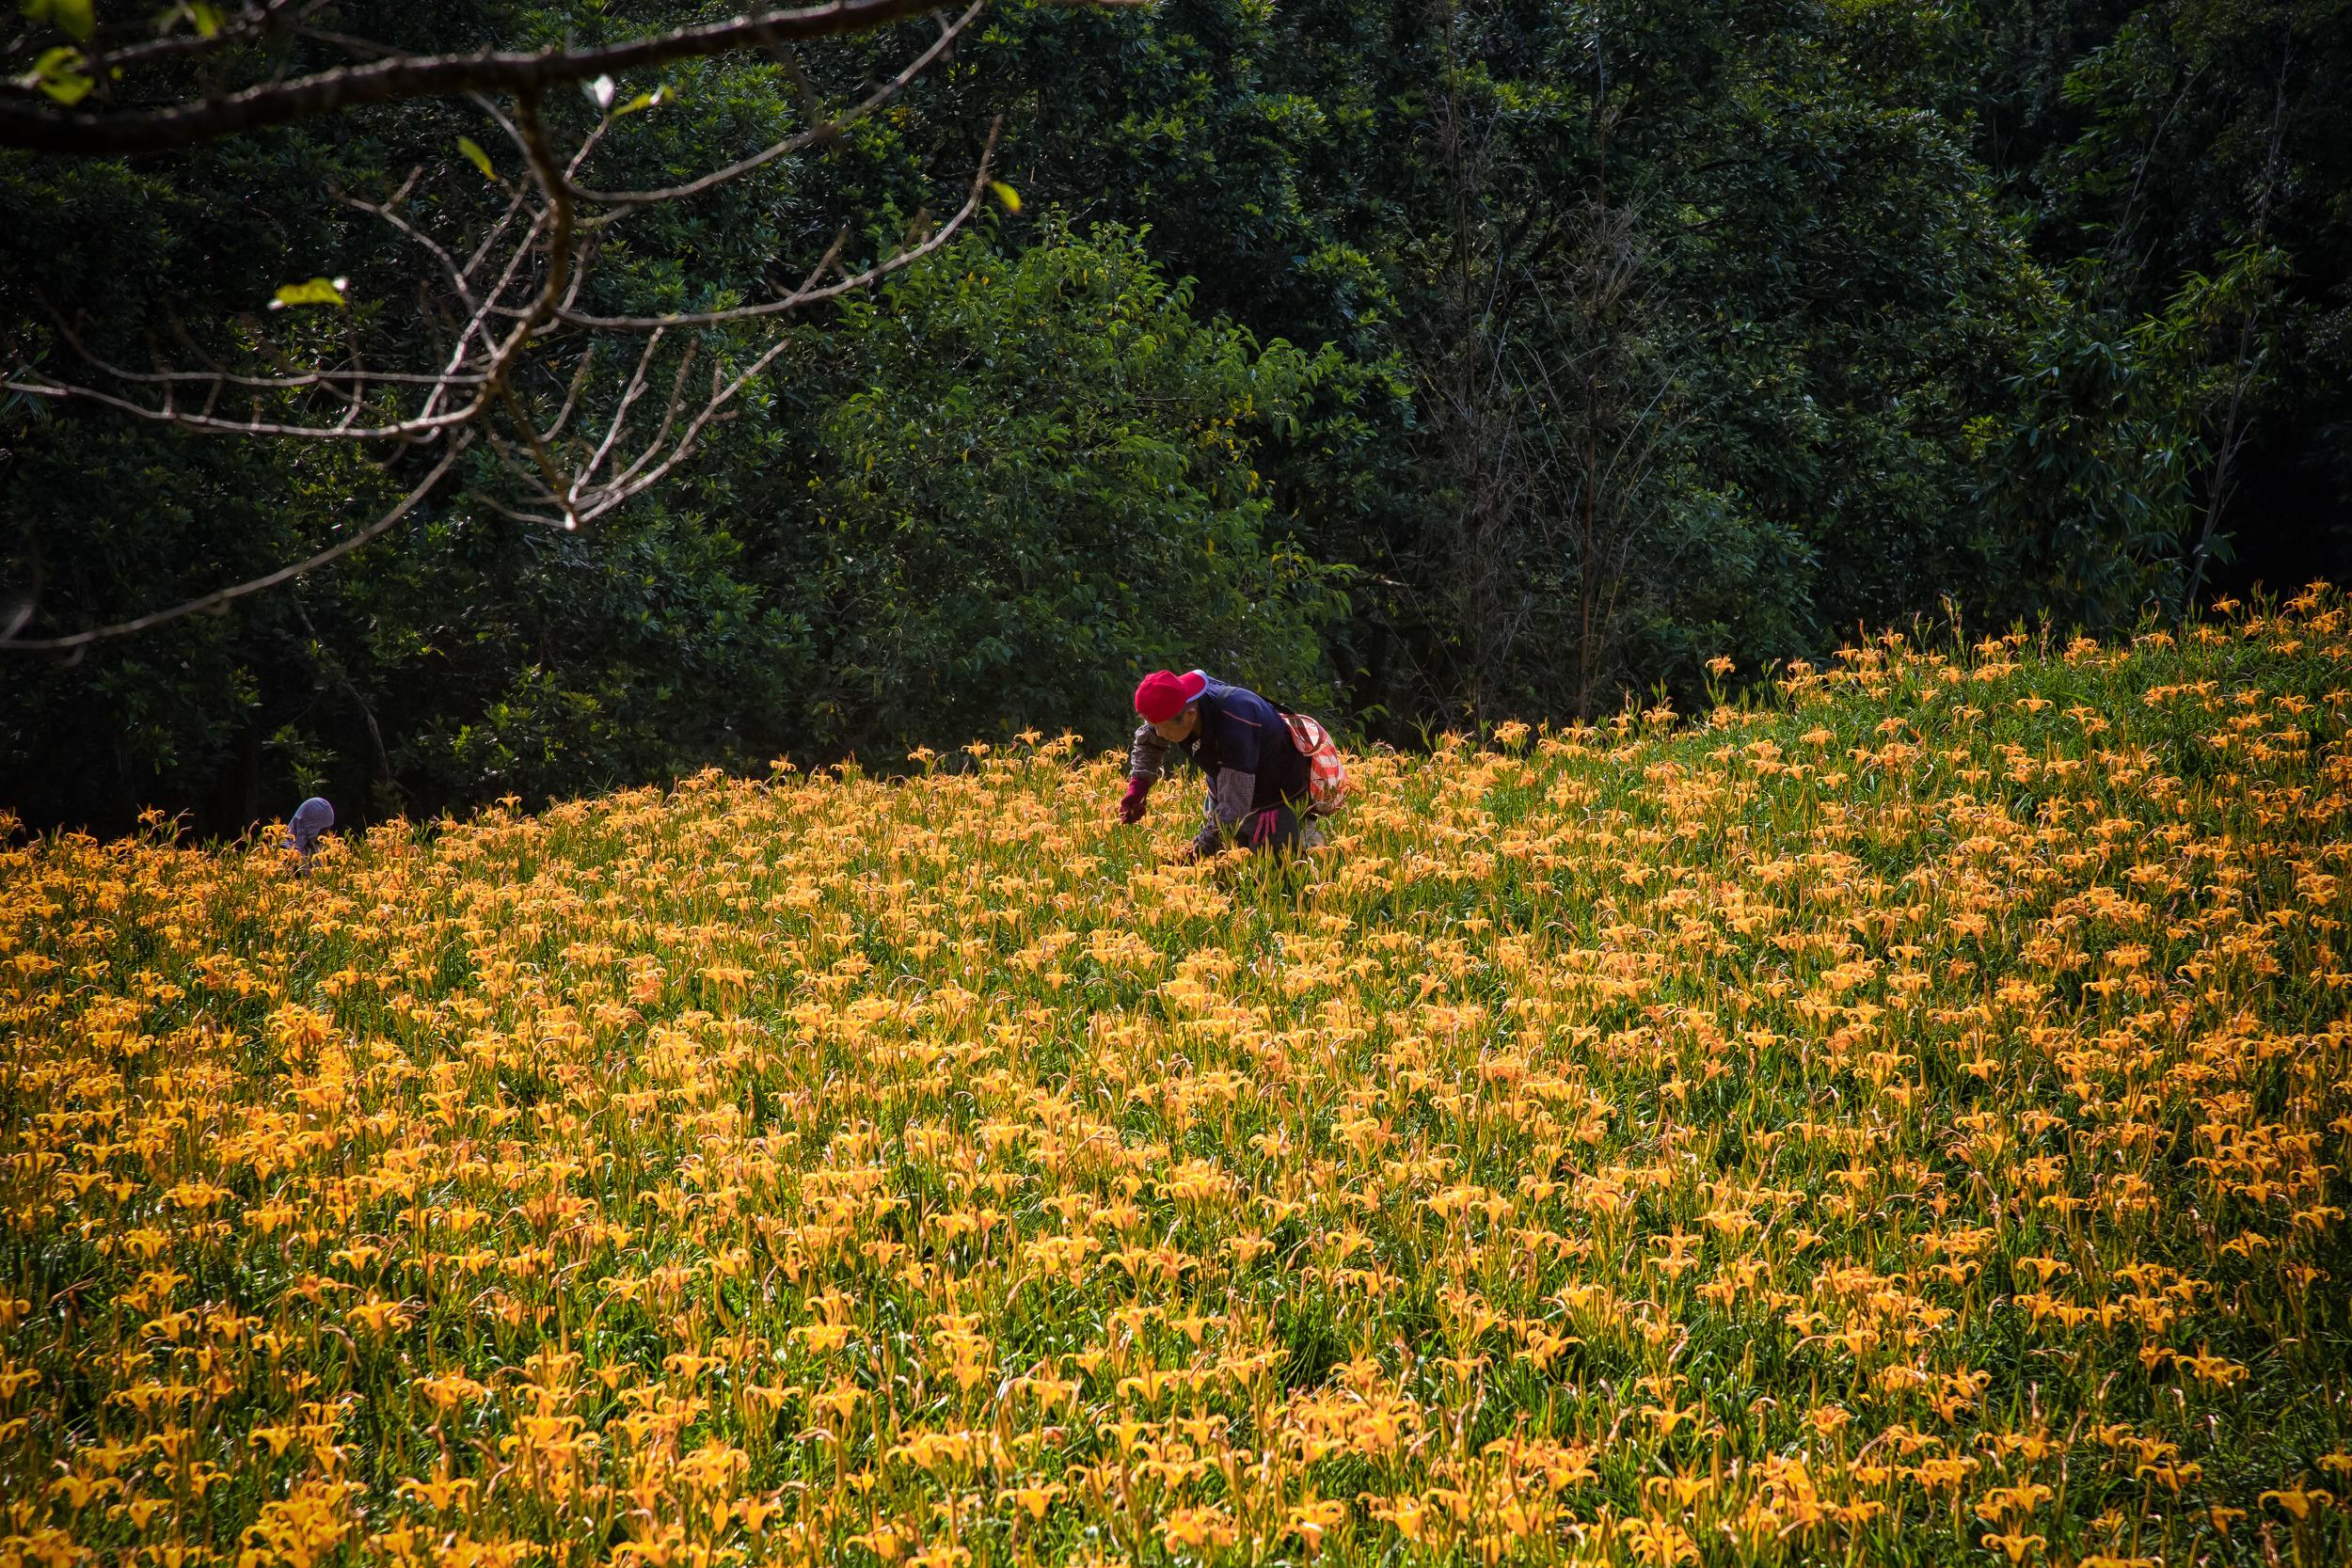 Picking lilies